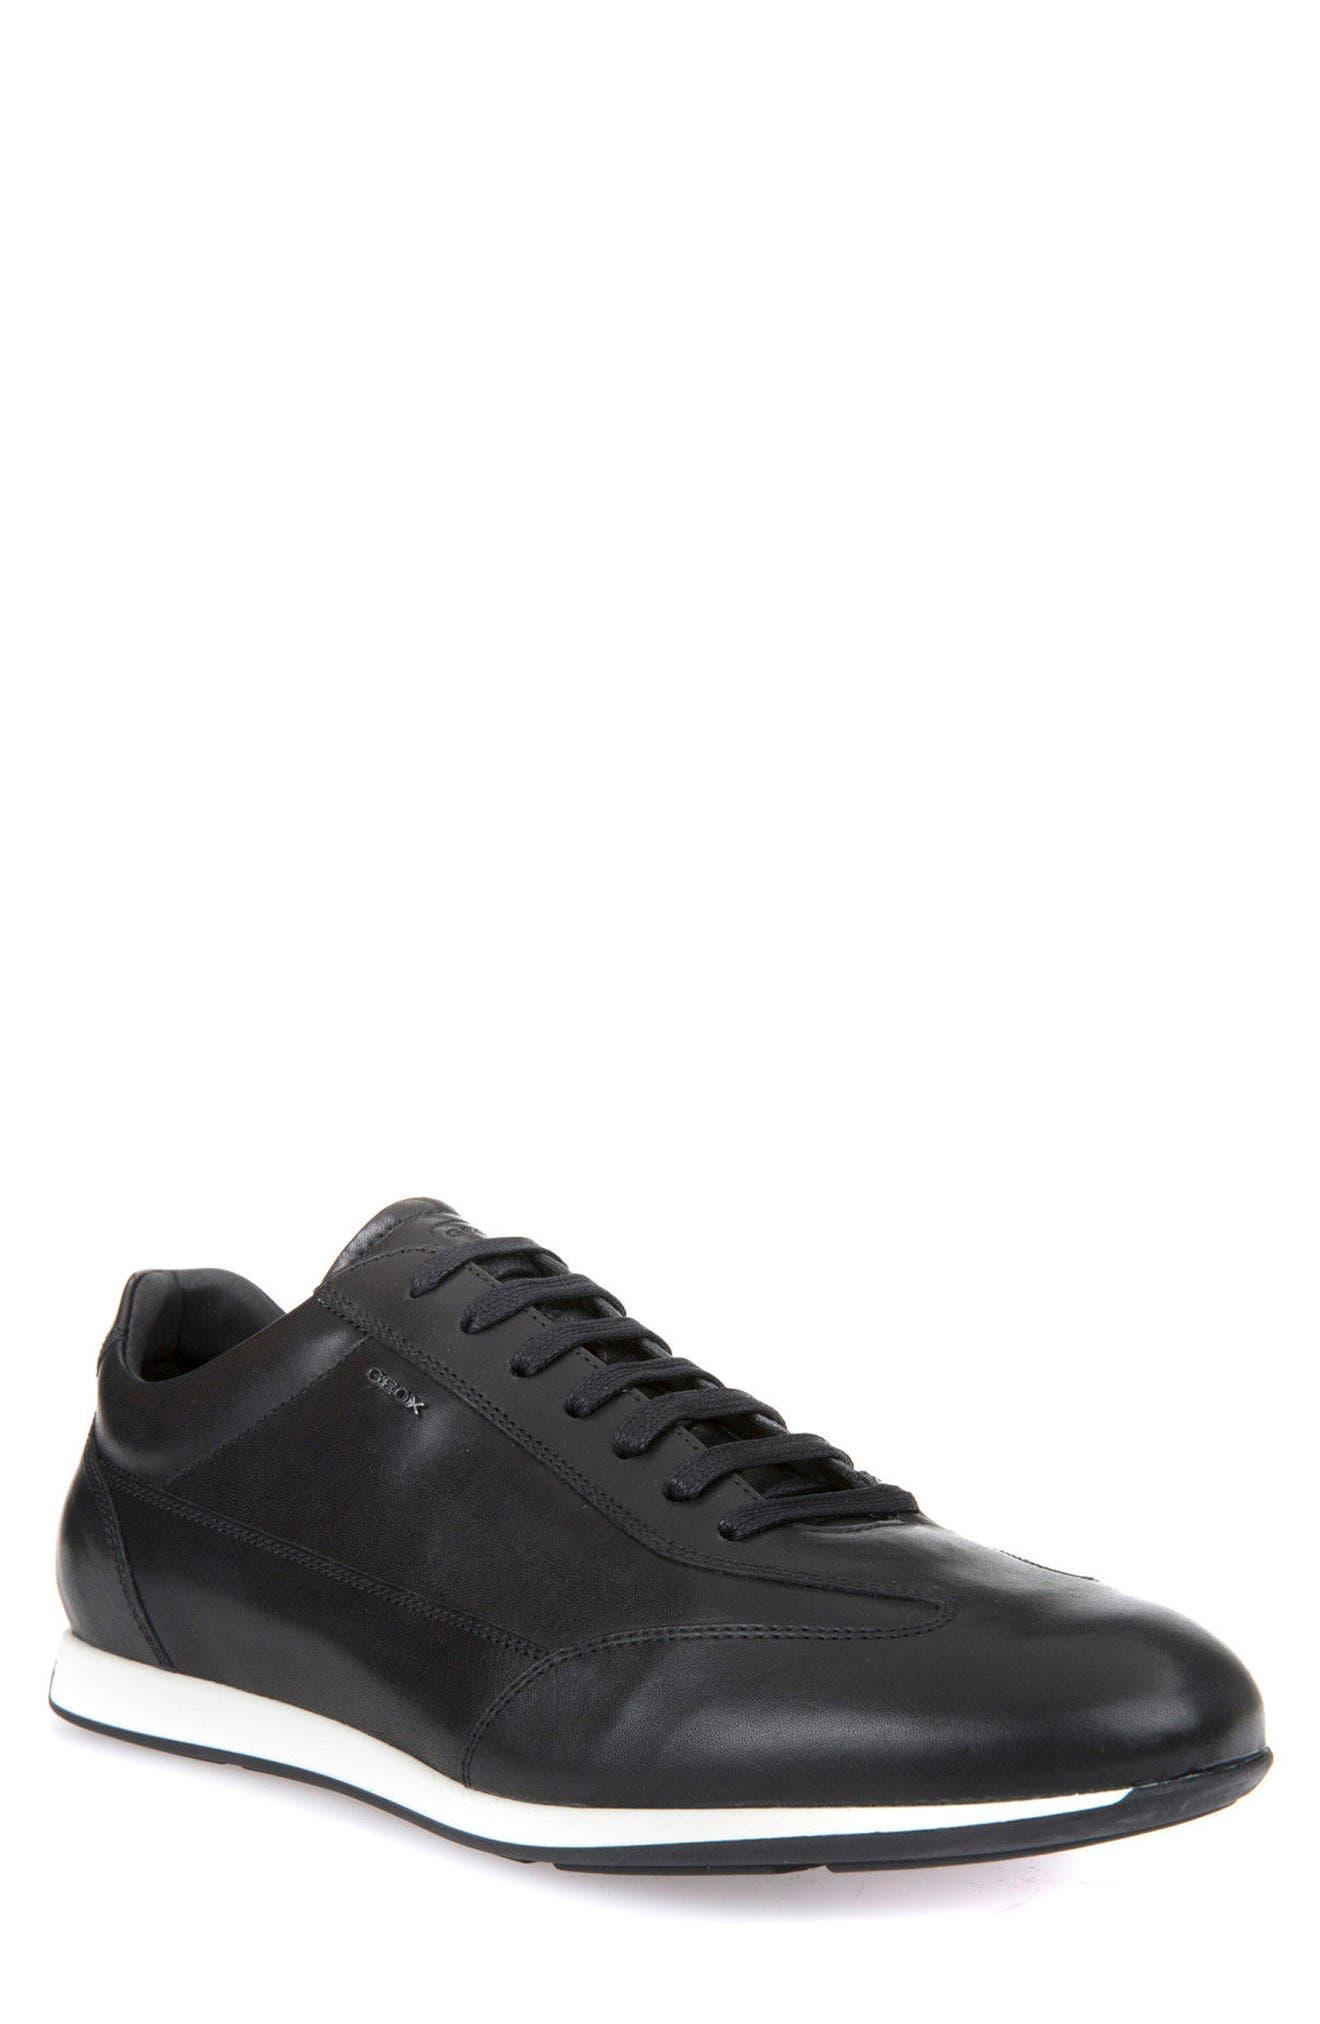 Clemet 1 Sneaker,                             Main thumbnail 1, color,